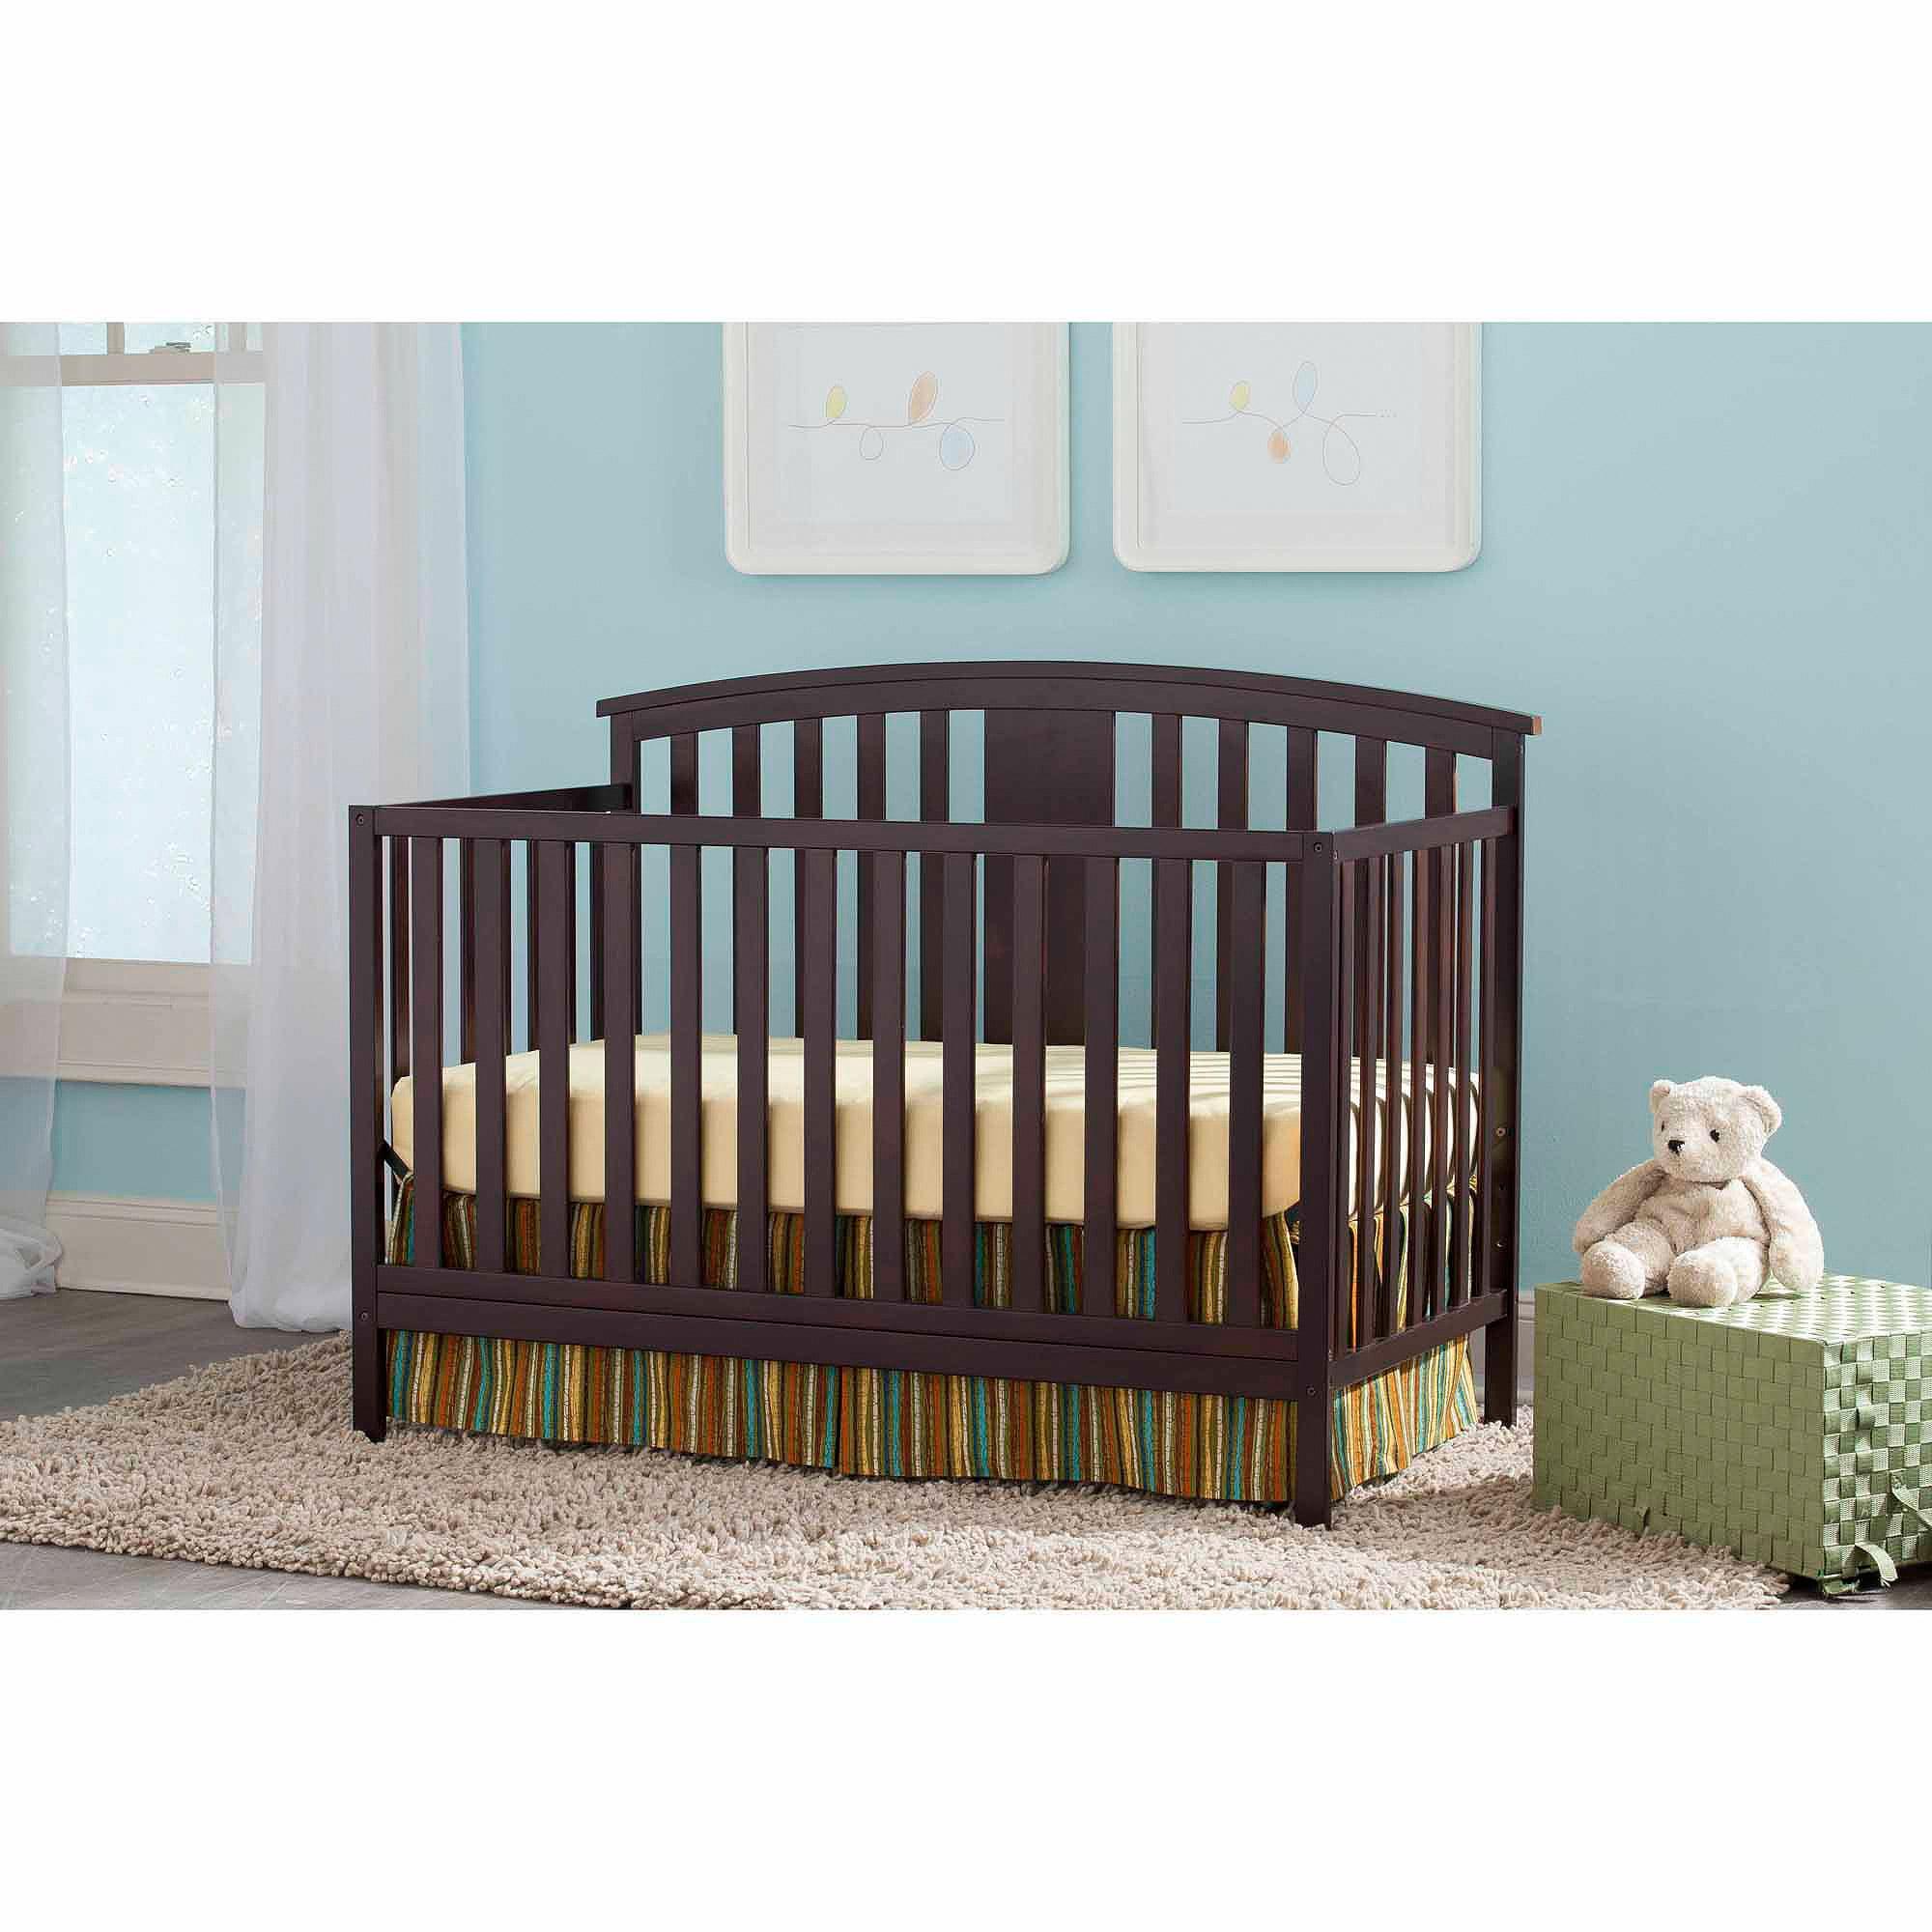 Stork craft crib reviews - Stork Craft Crib Reviews 53